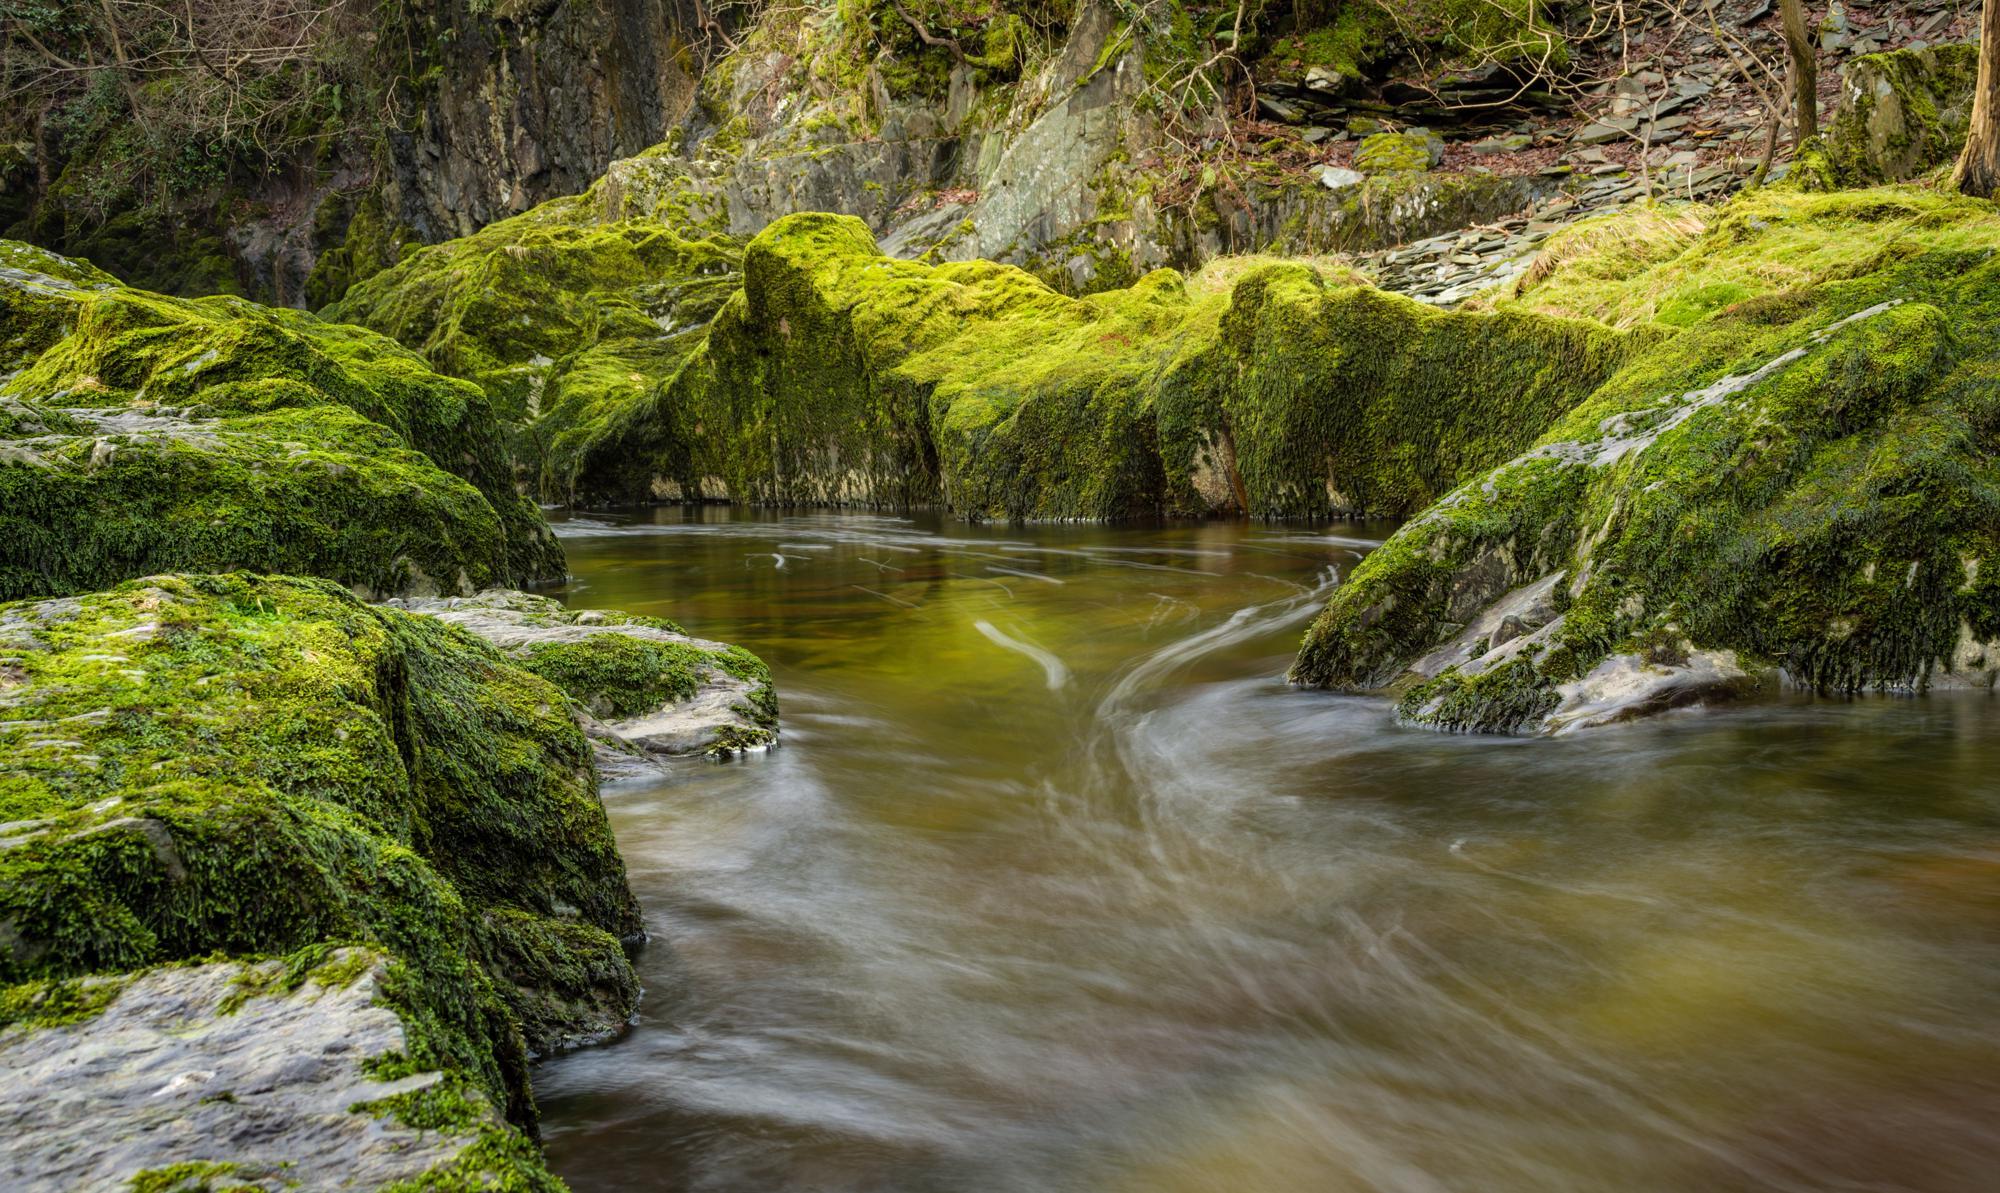 Ingleton Camping | Campsites in Ingleton, North Yorkshire